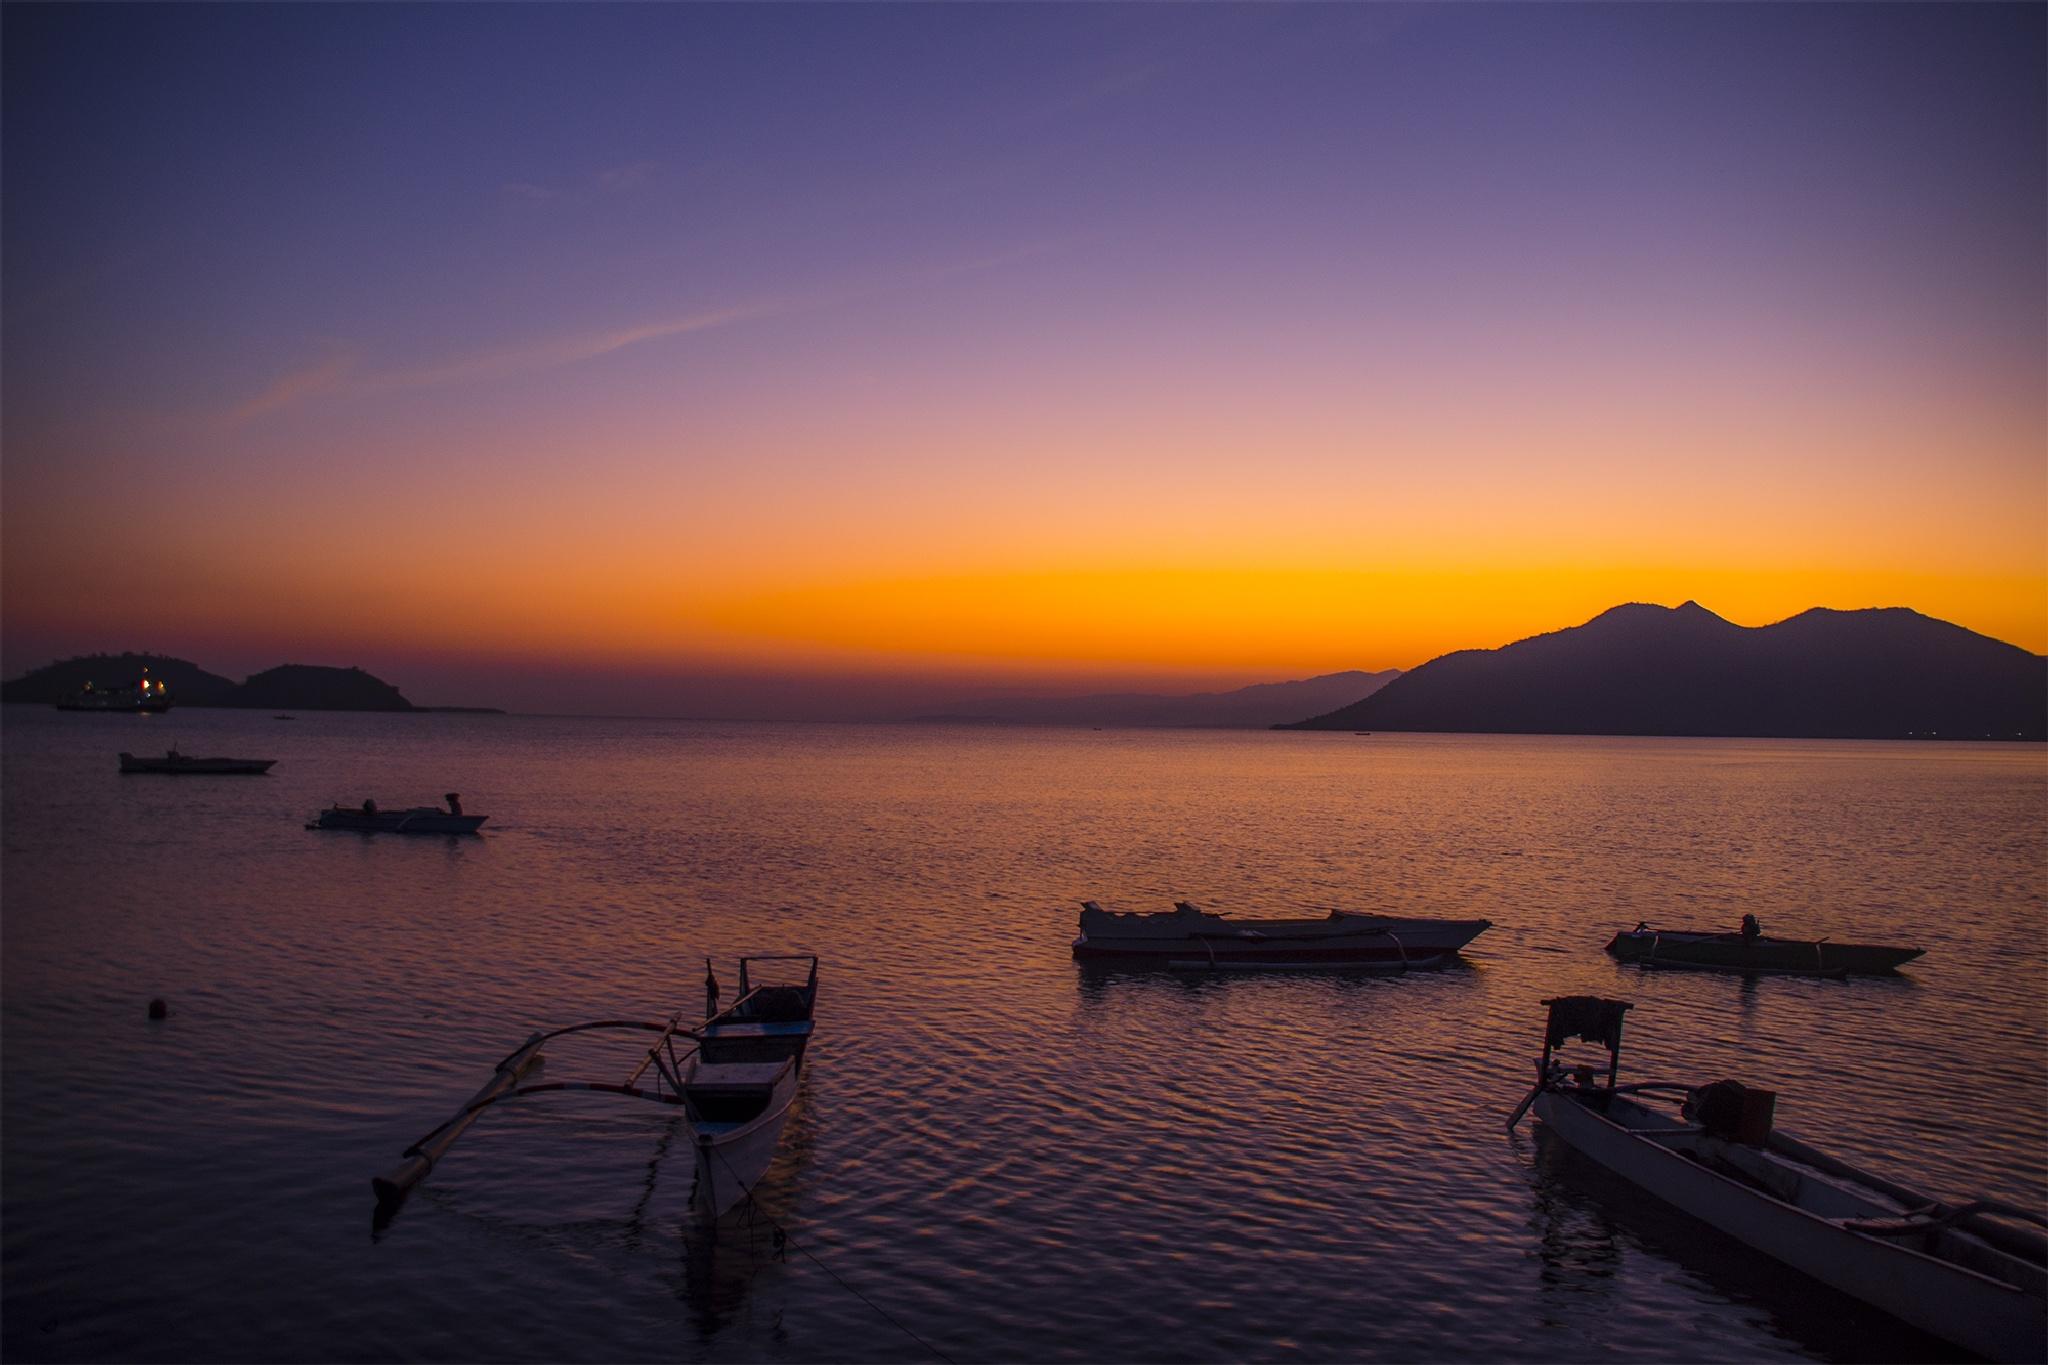 Sunrise by bennysjafrudin